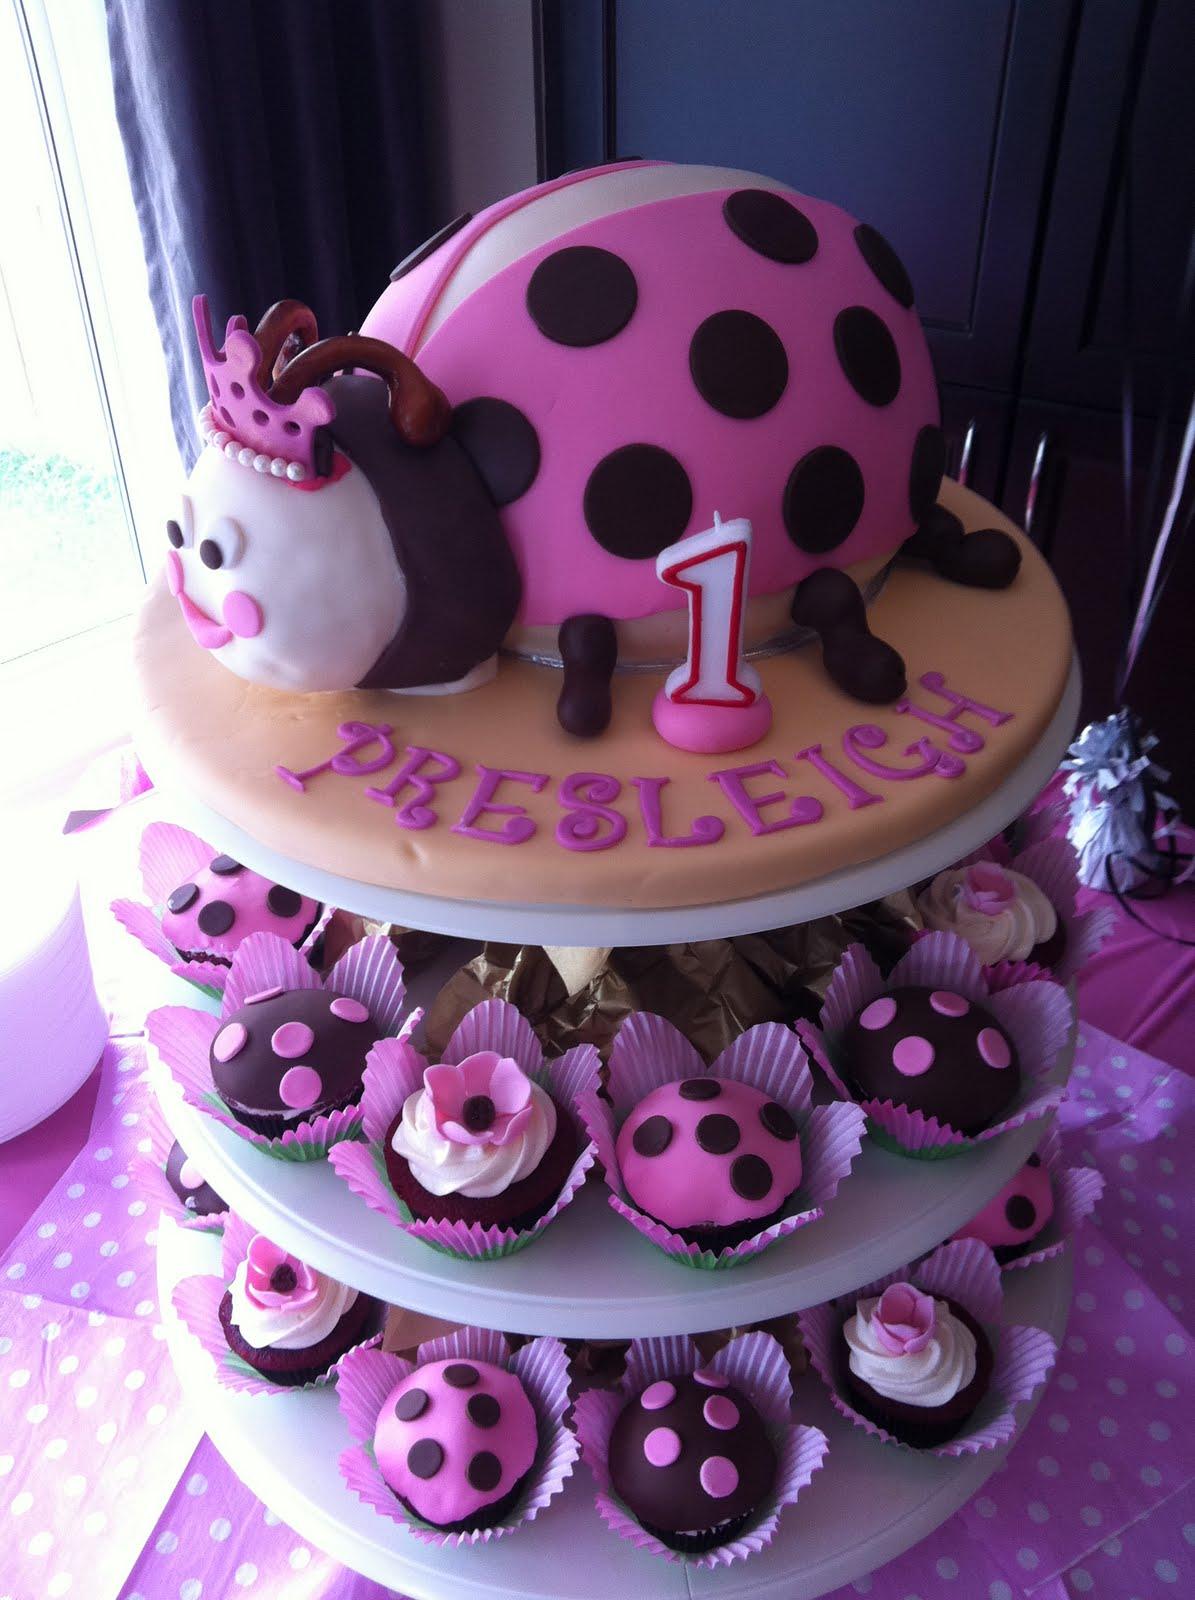 Jocelyns Wedding Cakes And More Ladybug Cupcakesladybug Brown